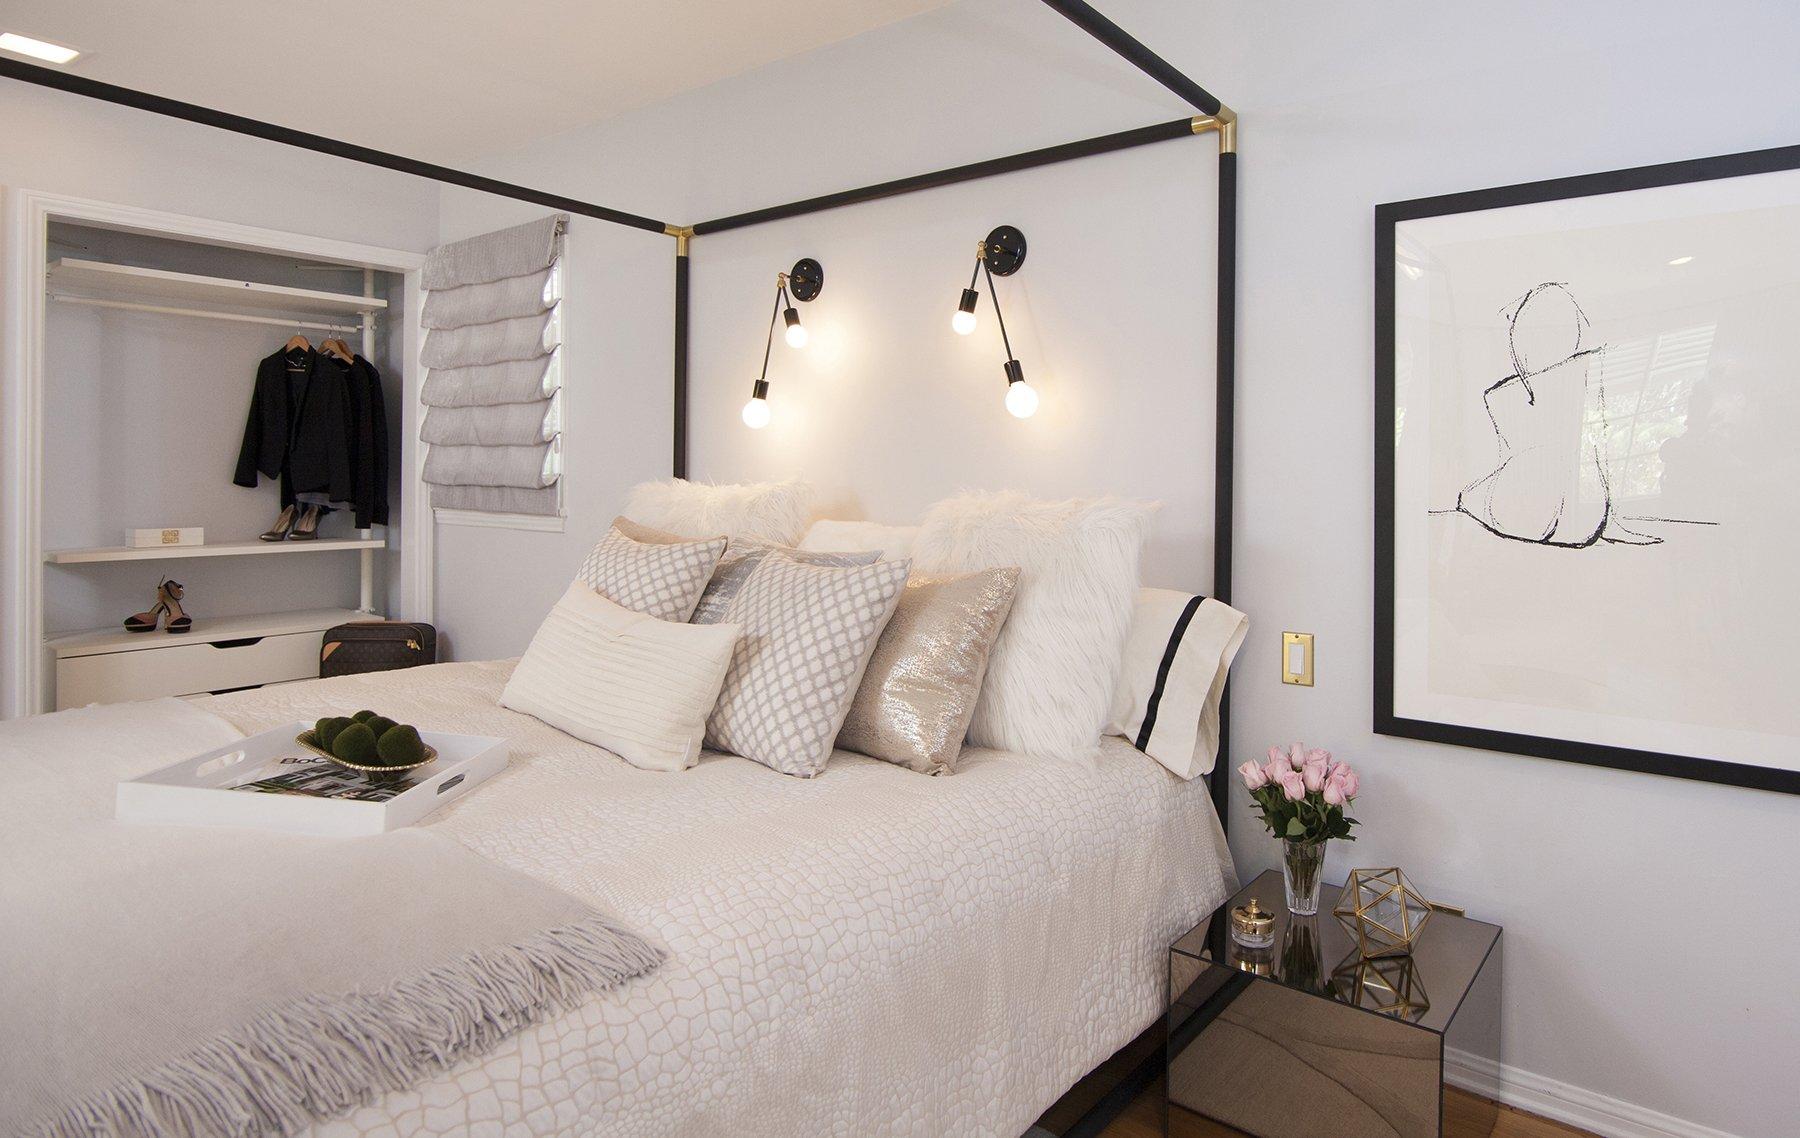 Studio 9 Interior Design Los Angeles Best Commercial Residential Designer Firm Santa Monica